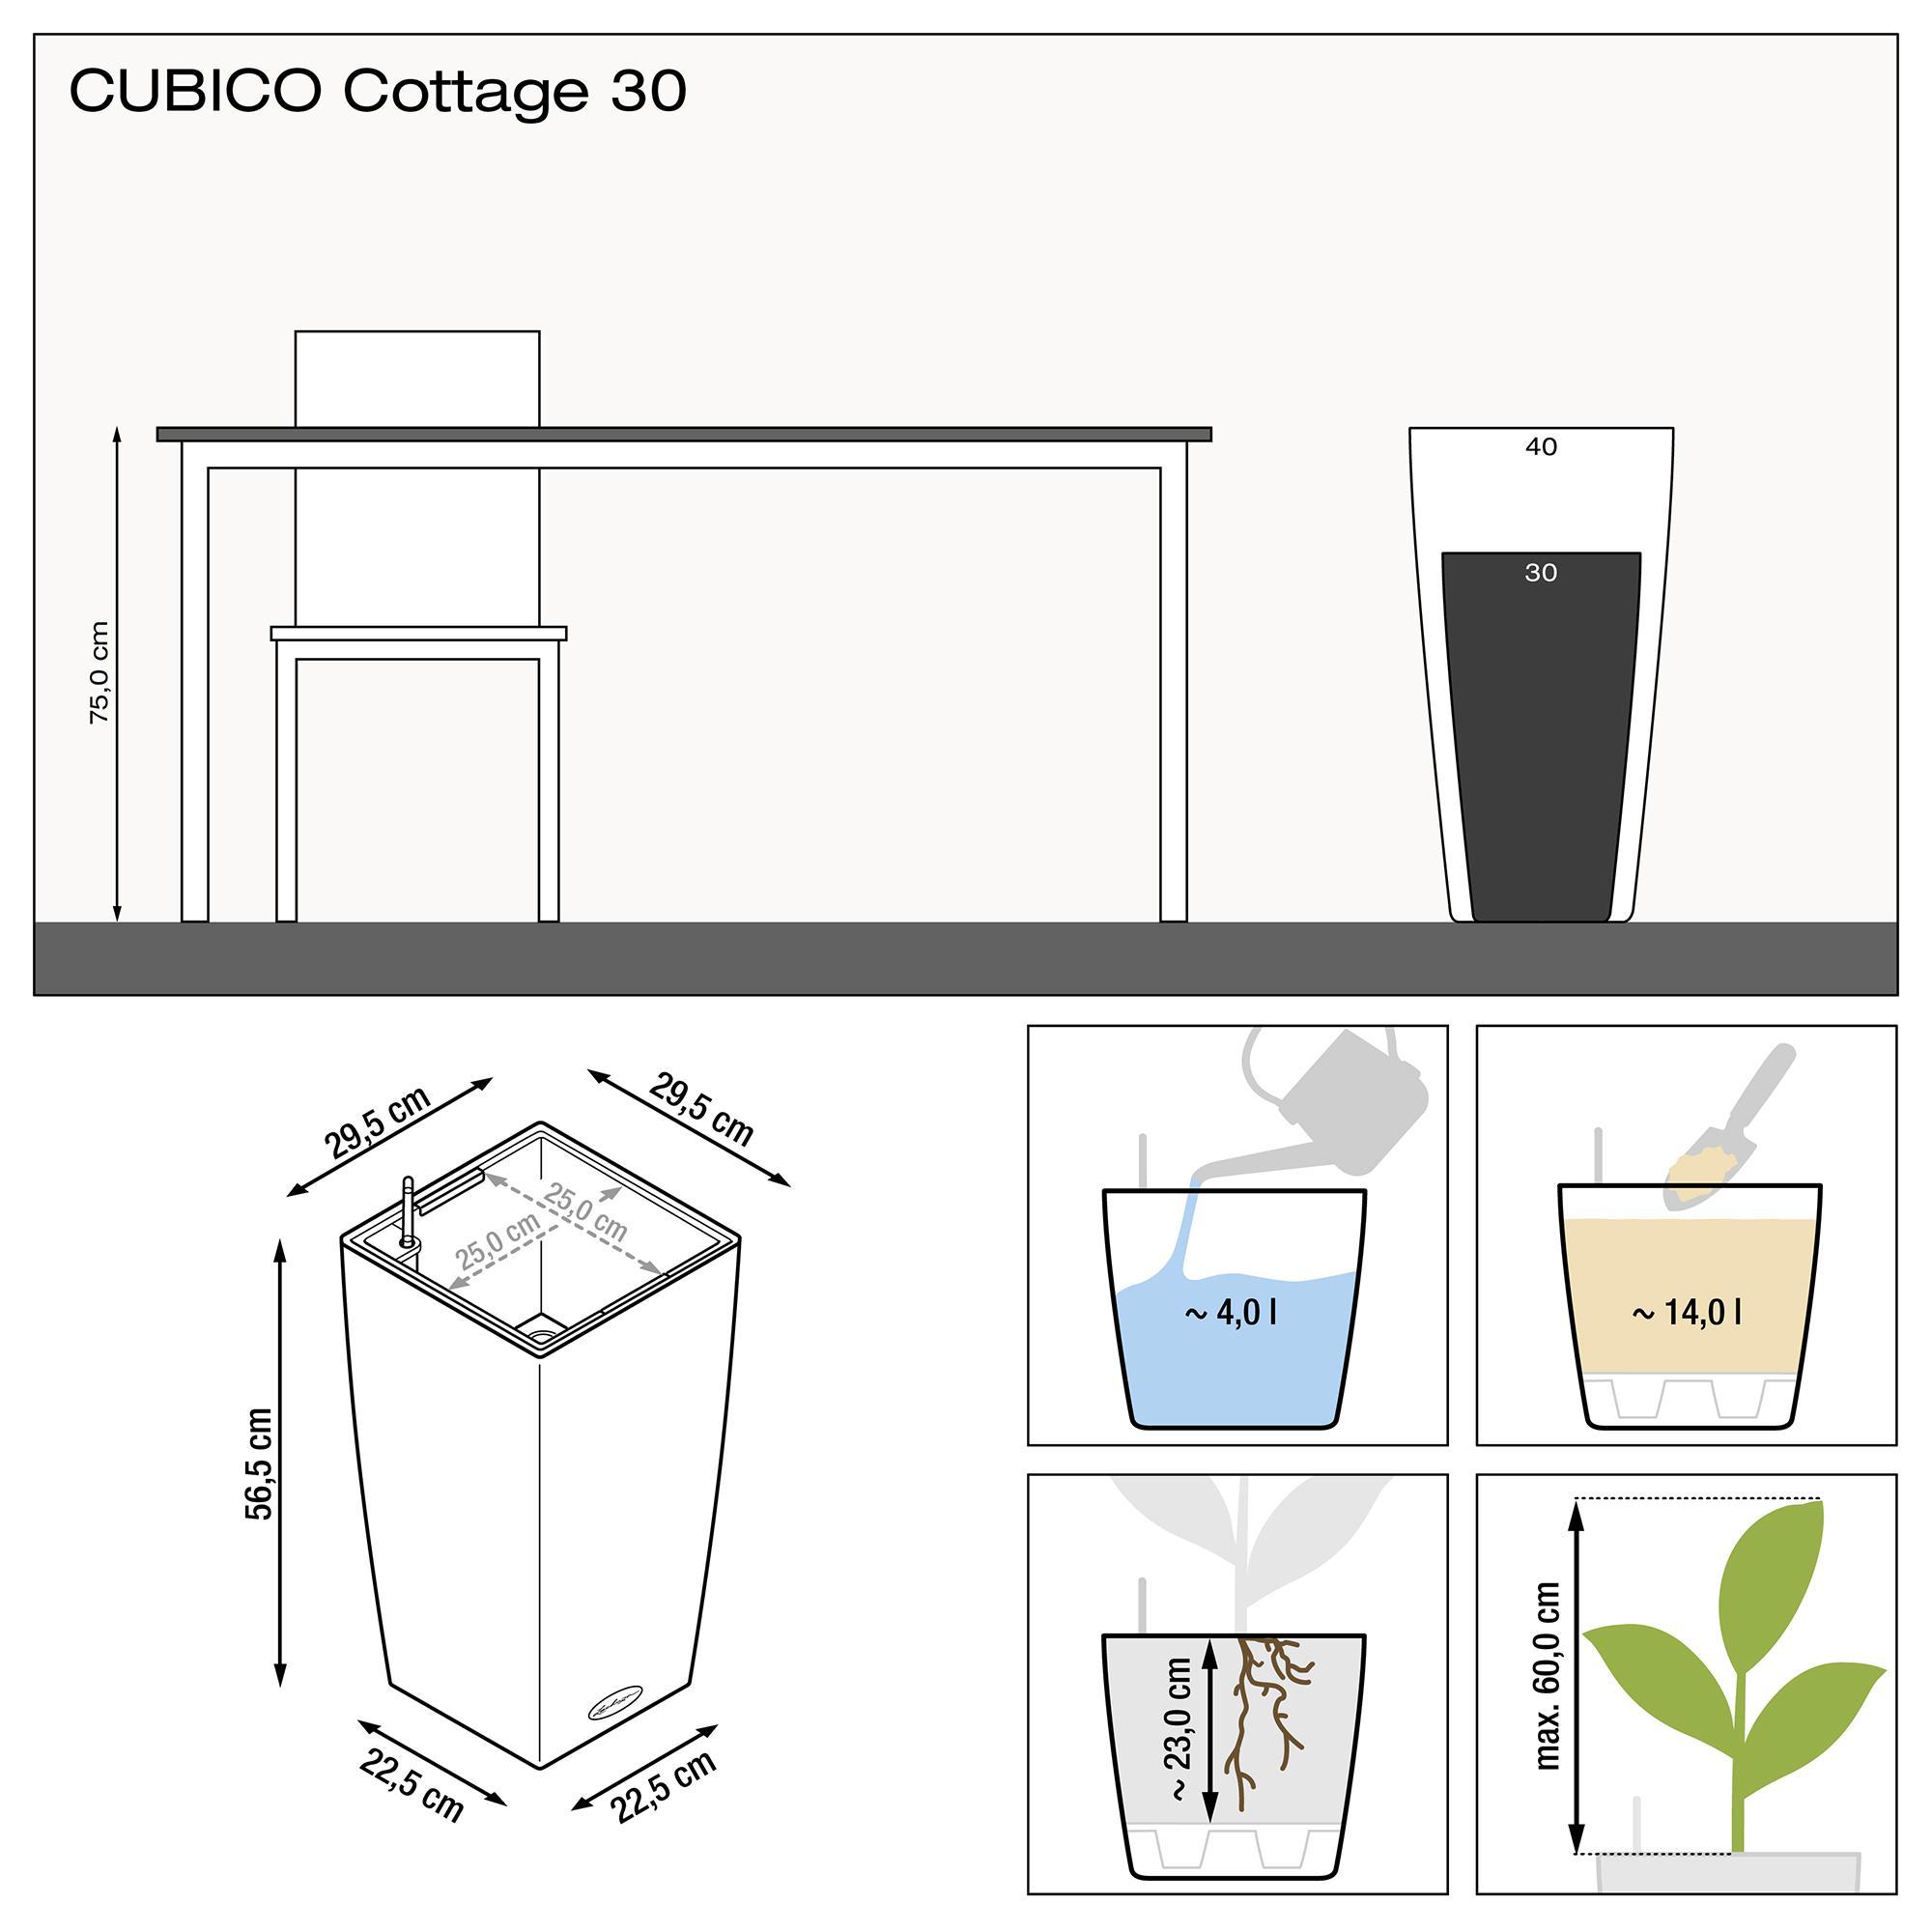 CUBICO Cottage 30 blanc - Image 3